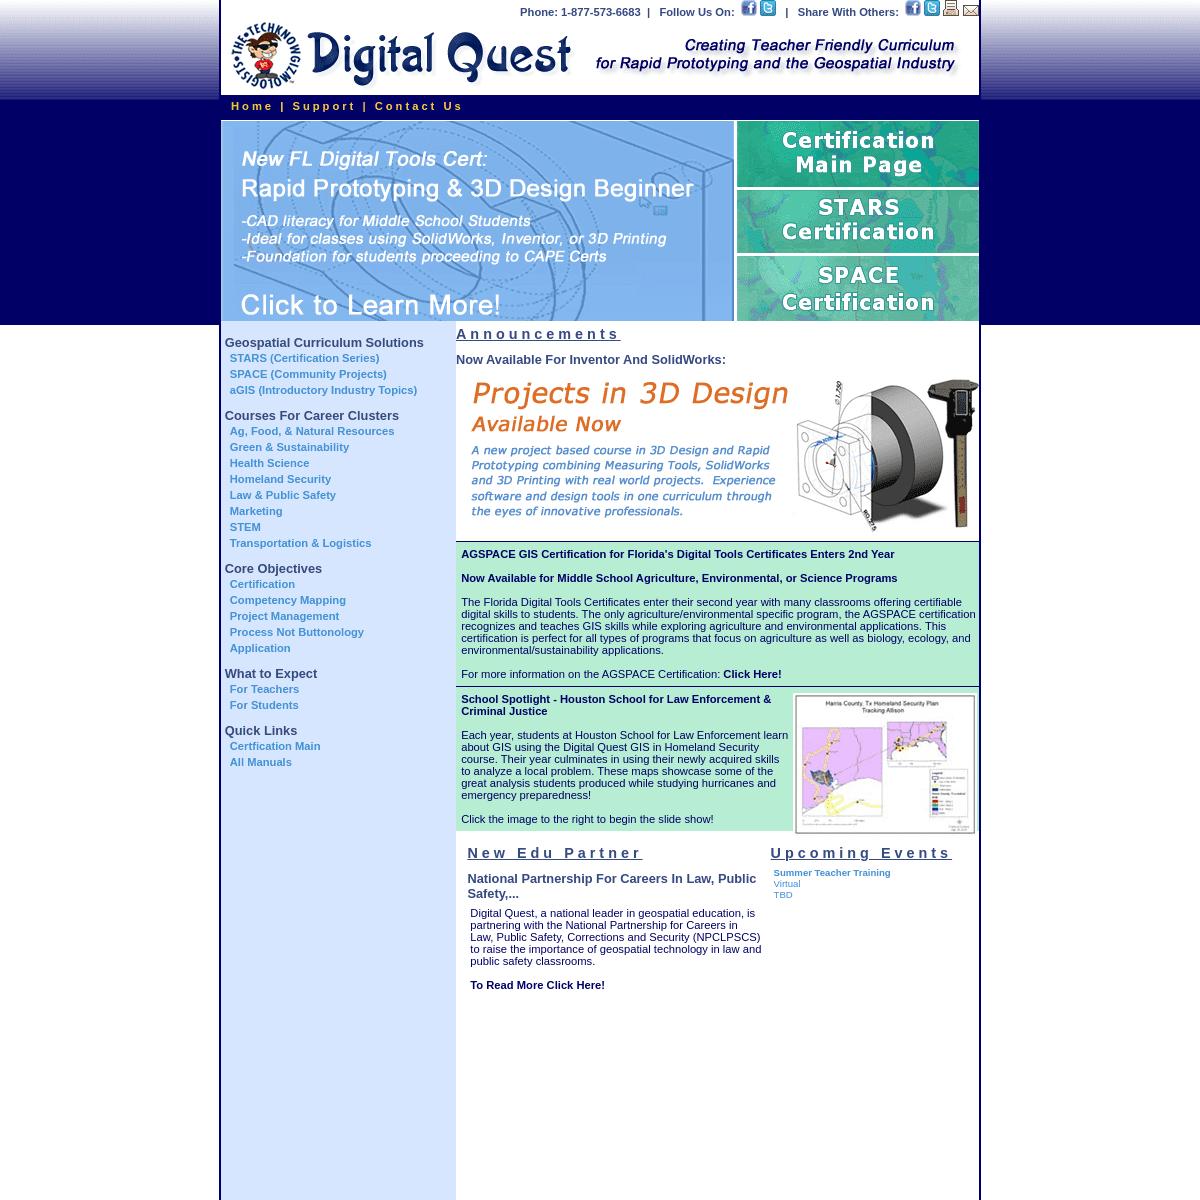 ArchiveBay.com - digitalquest.com - Digital Quest, Inc. - Rapid Prototyping & Geospatial Training